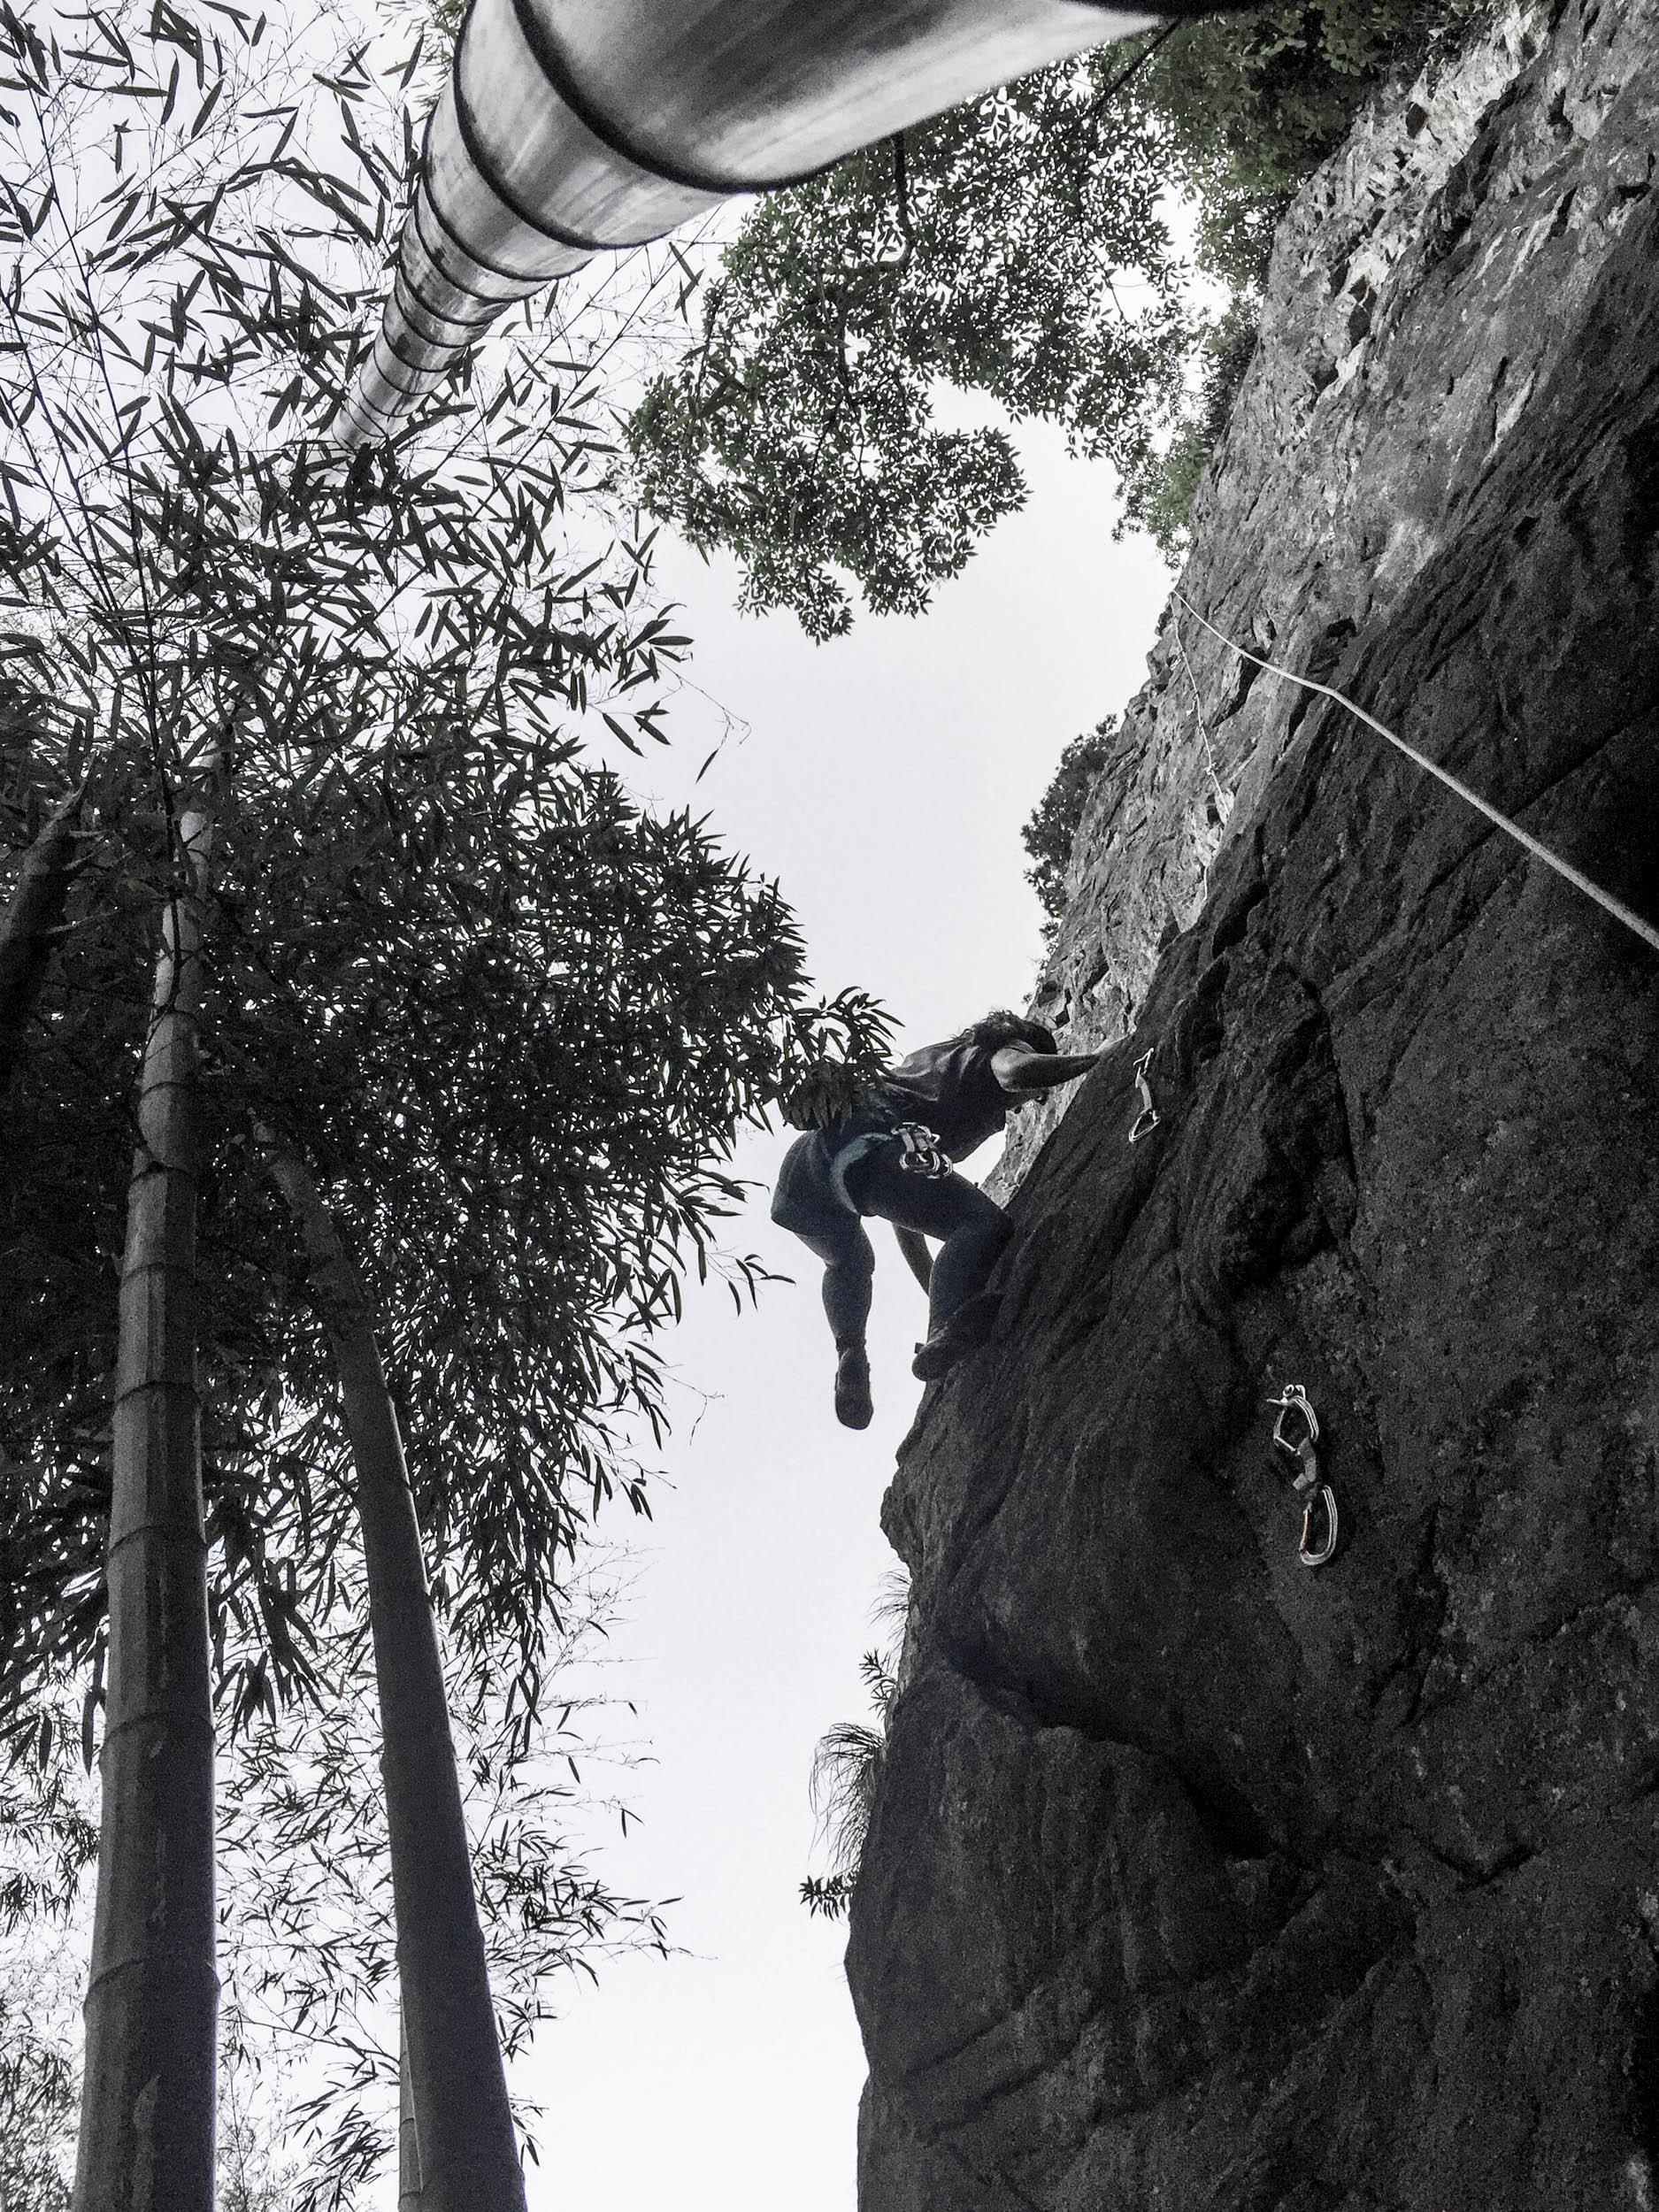 Climbing in Linan